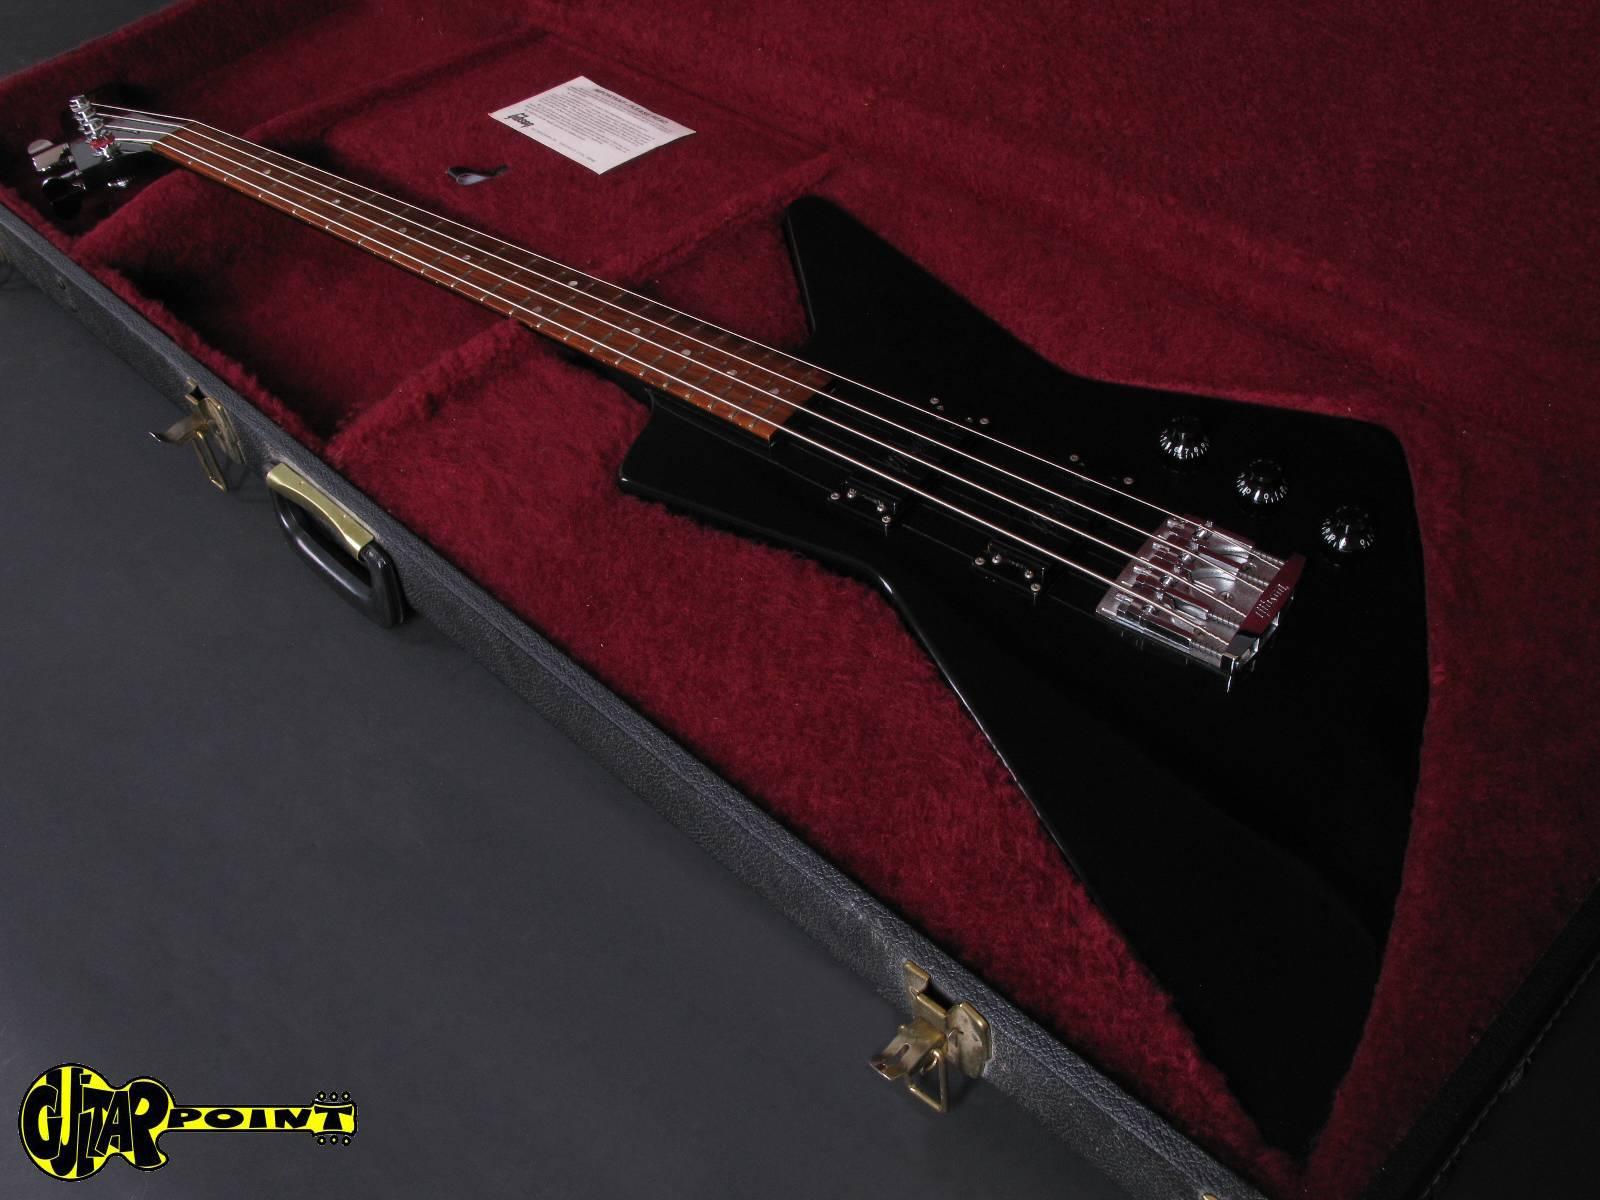 gibson explorer 1985 ebony black bass for sale guitarpoint. Black Bedroom Furniture Sets. Home Design Ideas